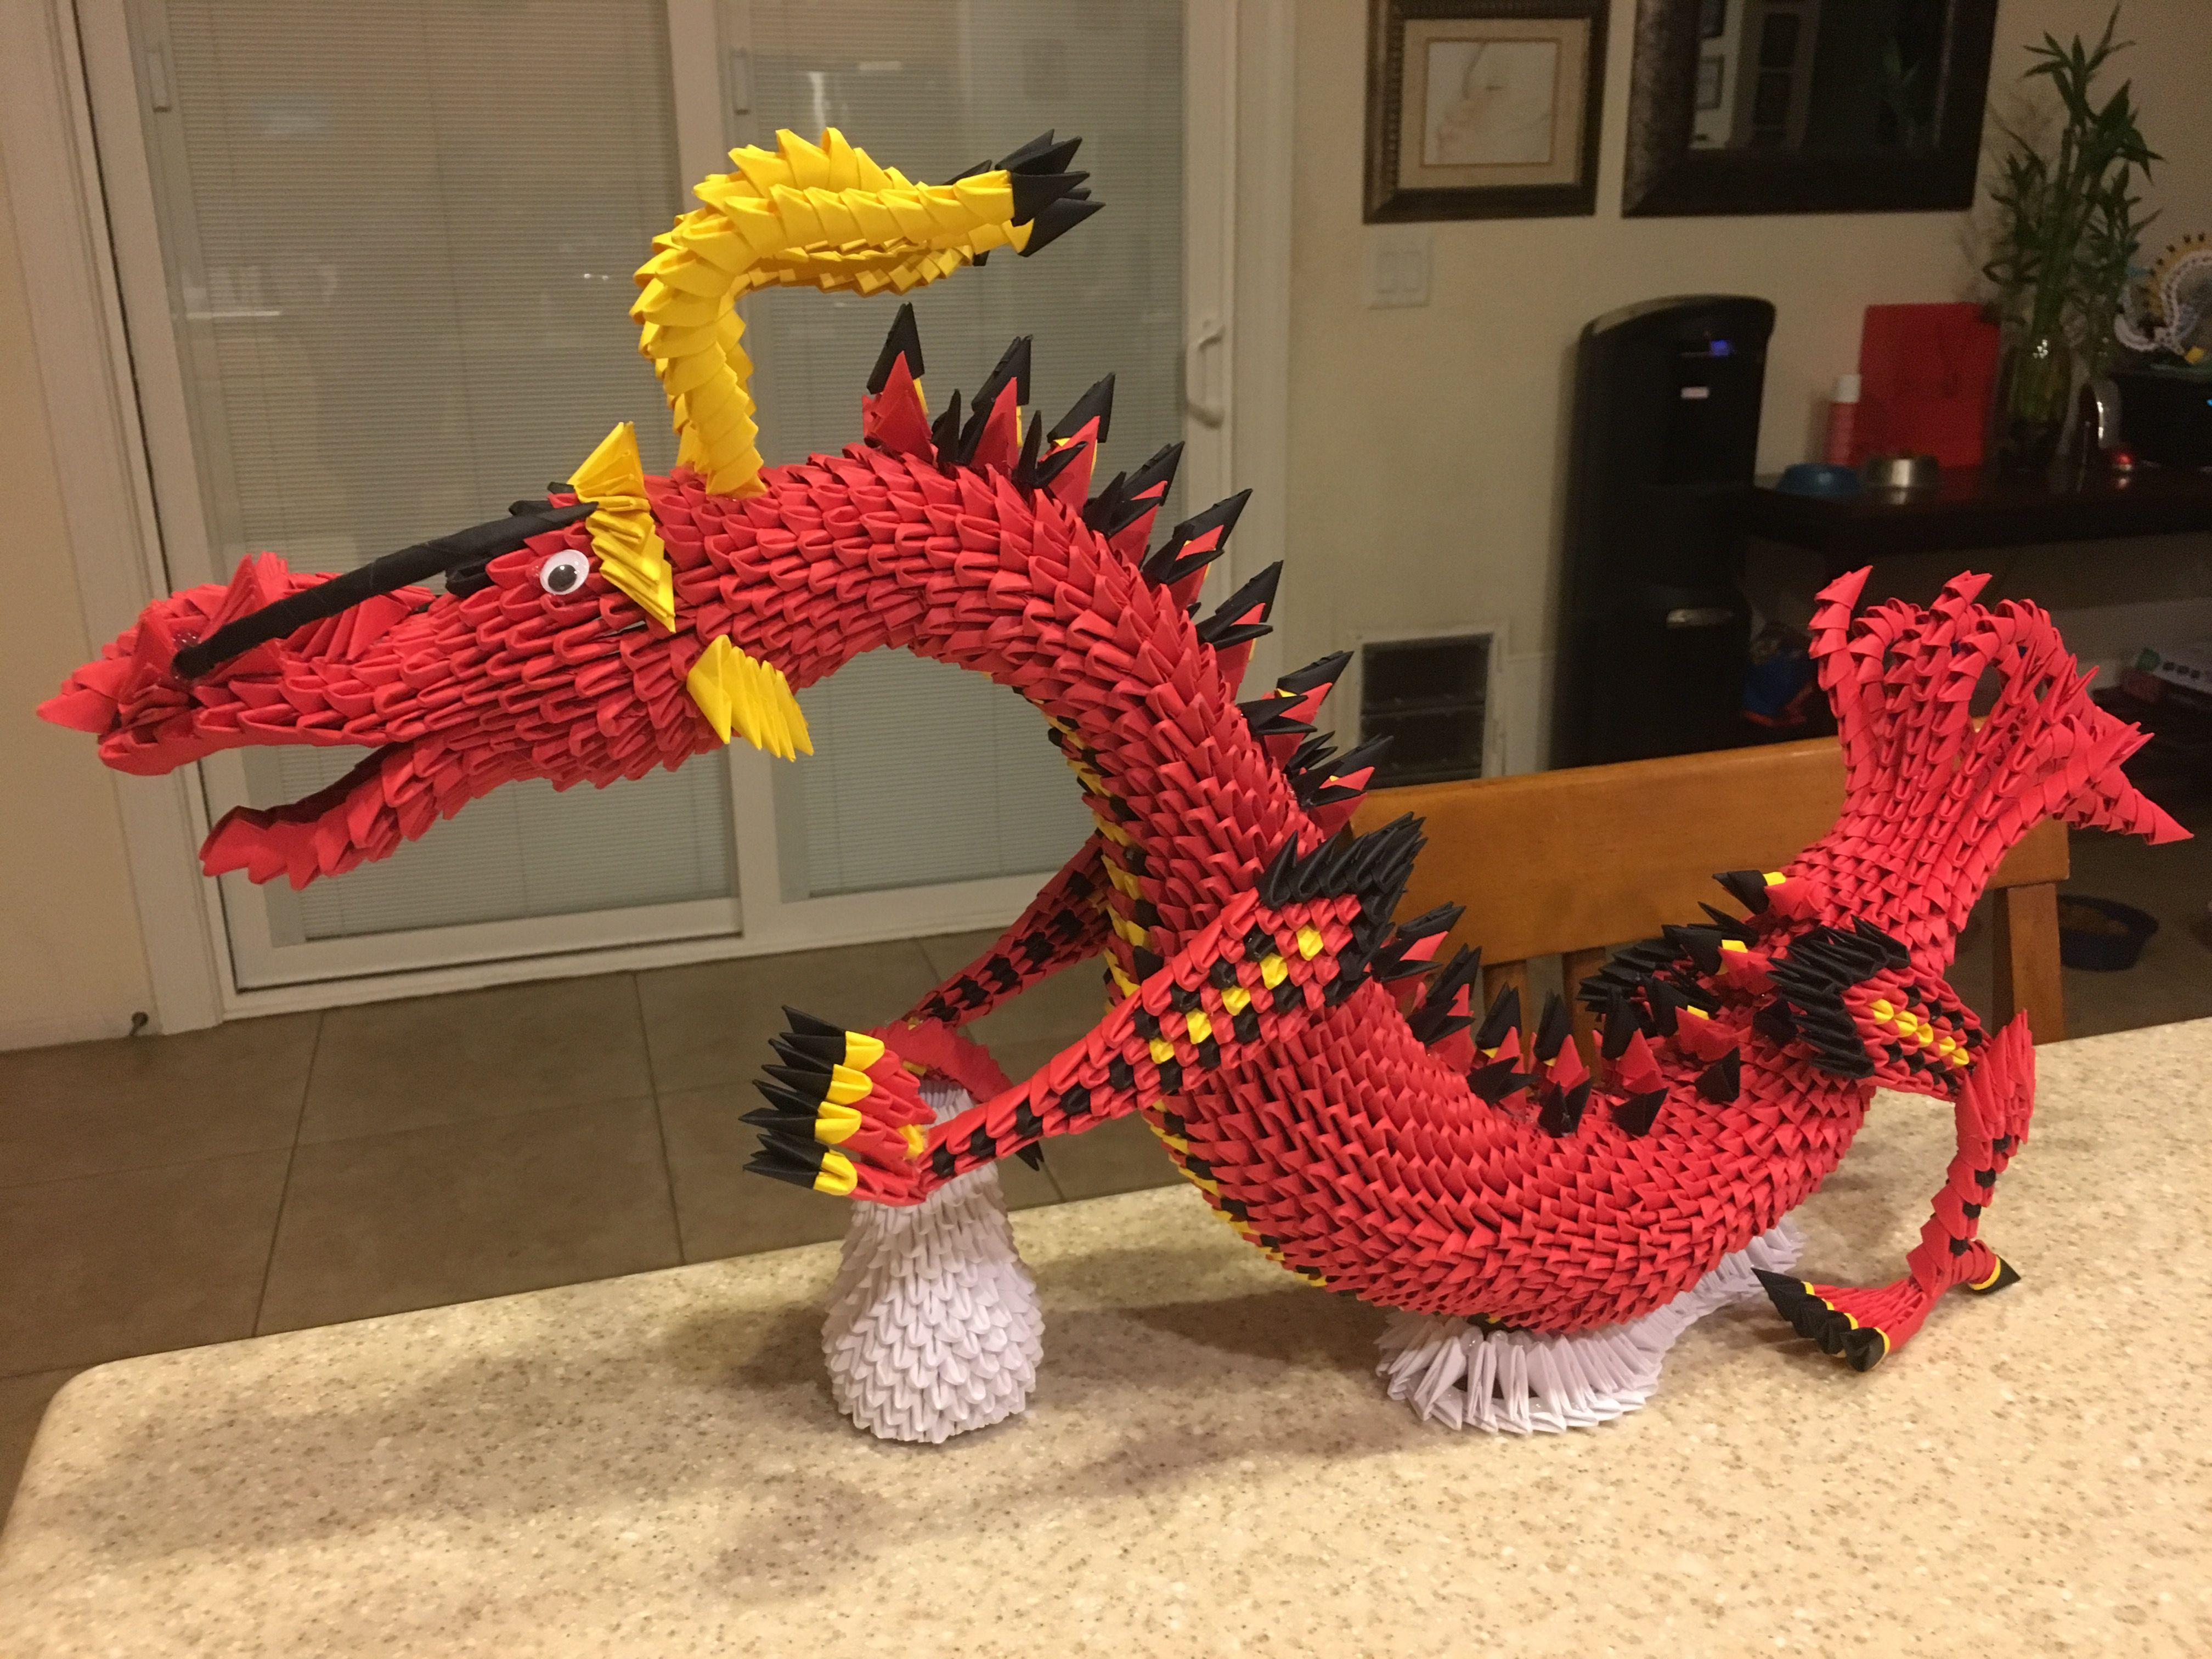 2019Red Dragon Dinosaur stuffed animal, 3d origami, Dinosaur